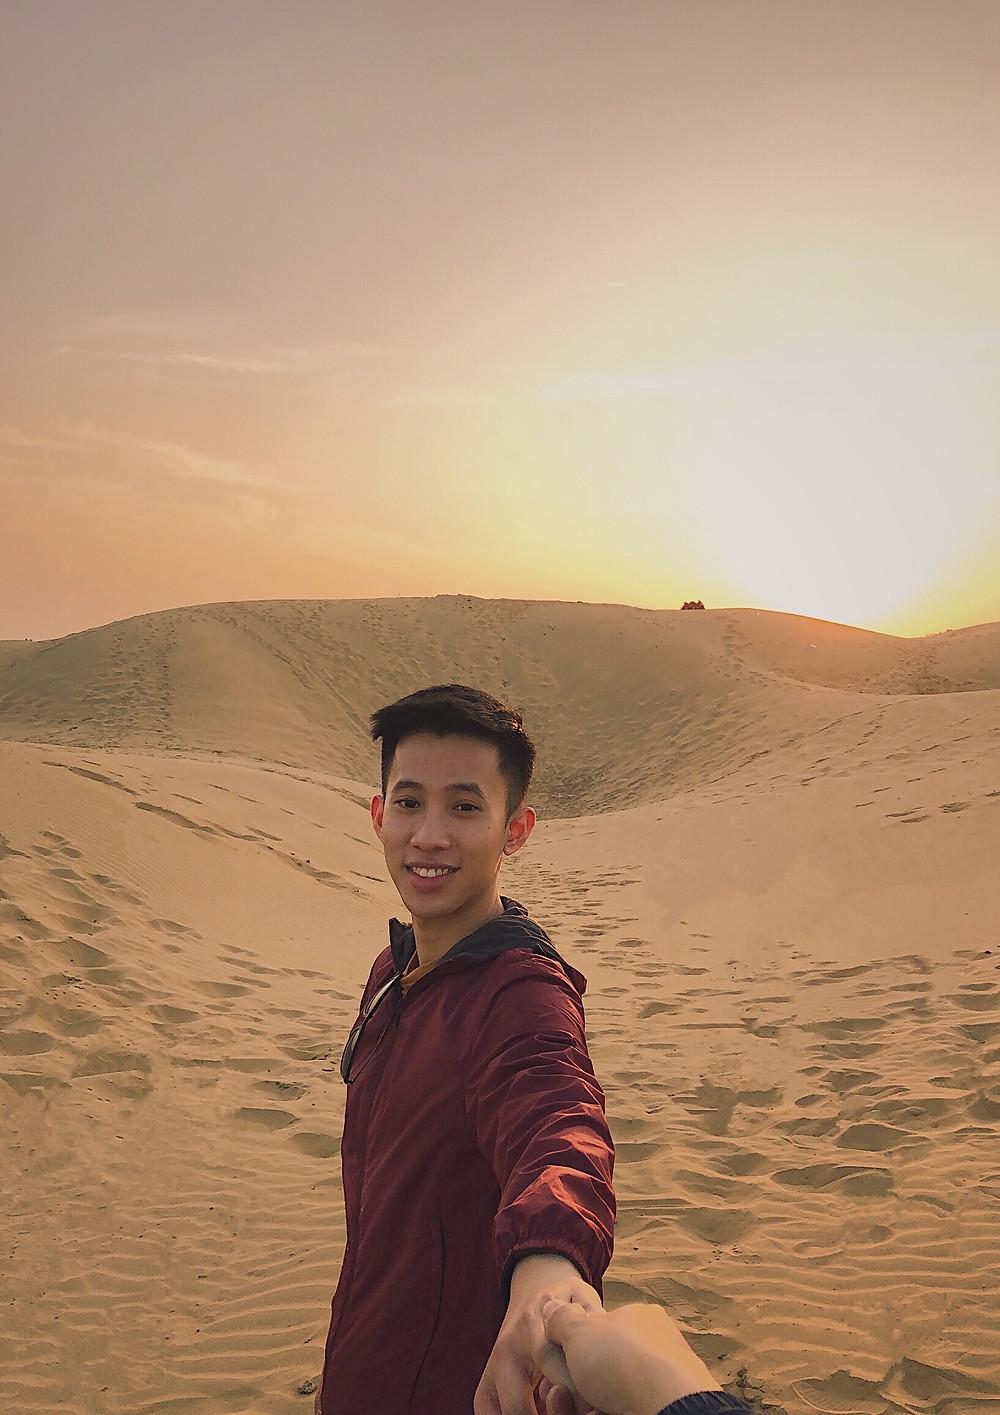 Sunset at Sam Sand Dunes, Jaisalmer, Rajasthan, India